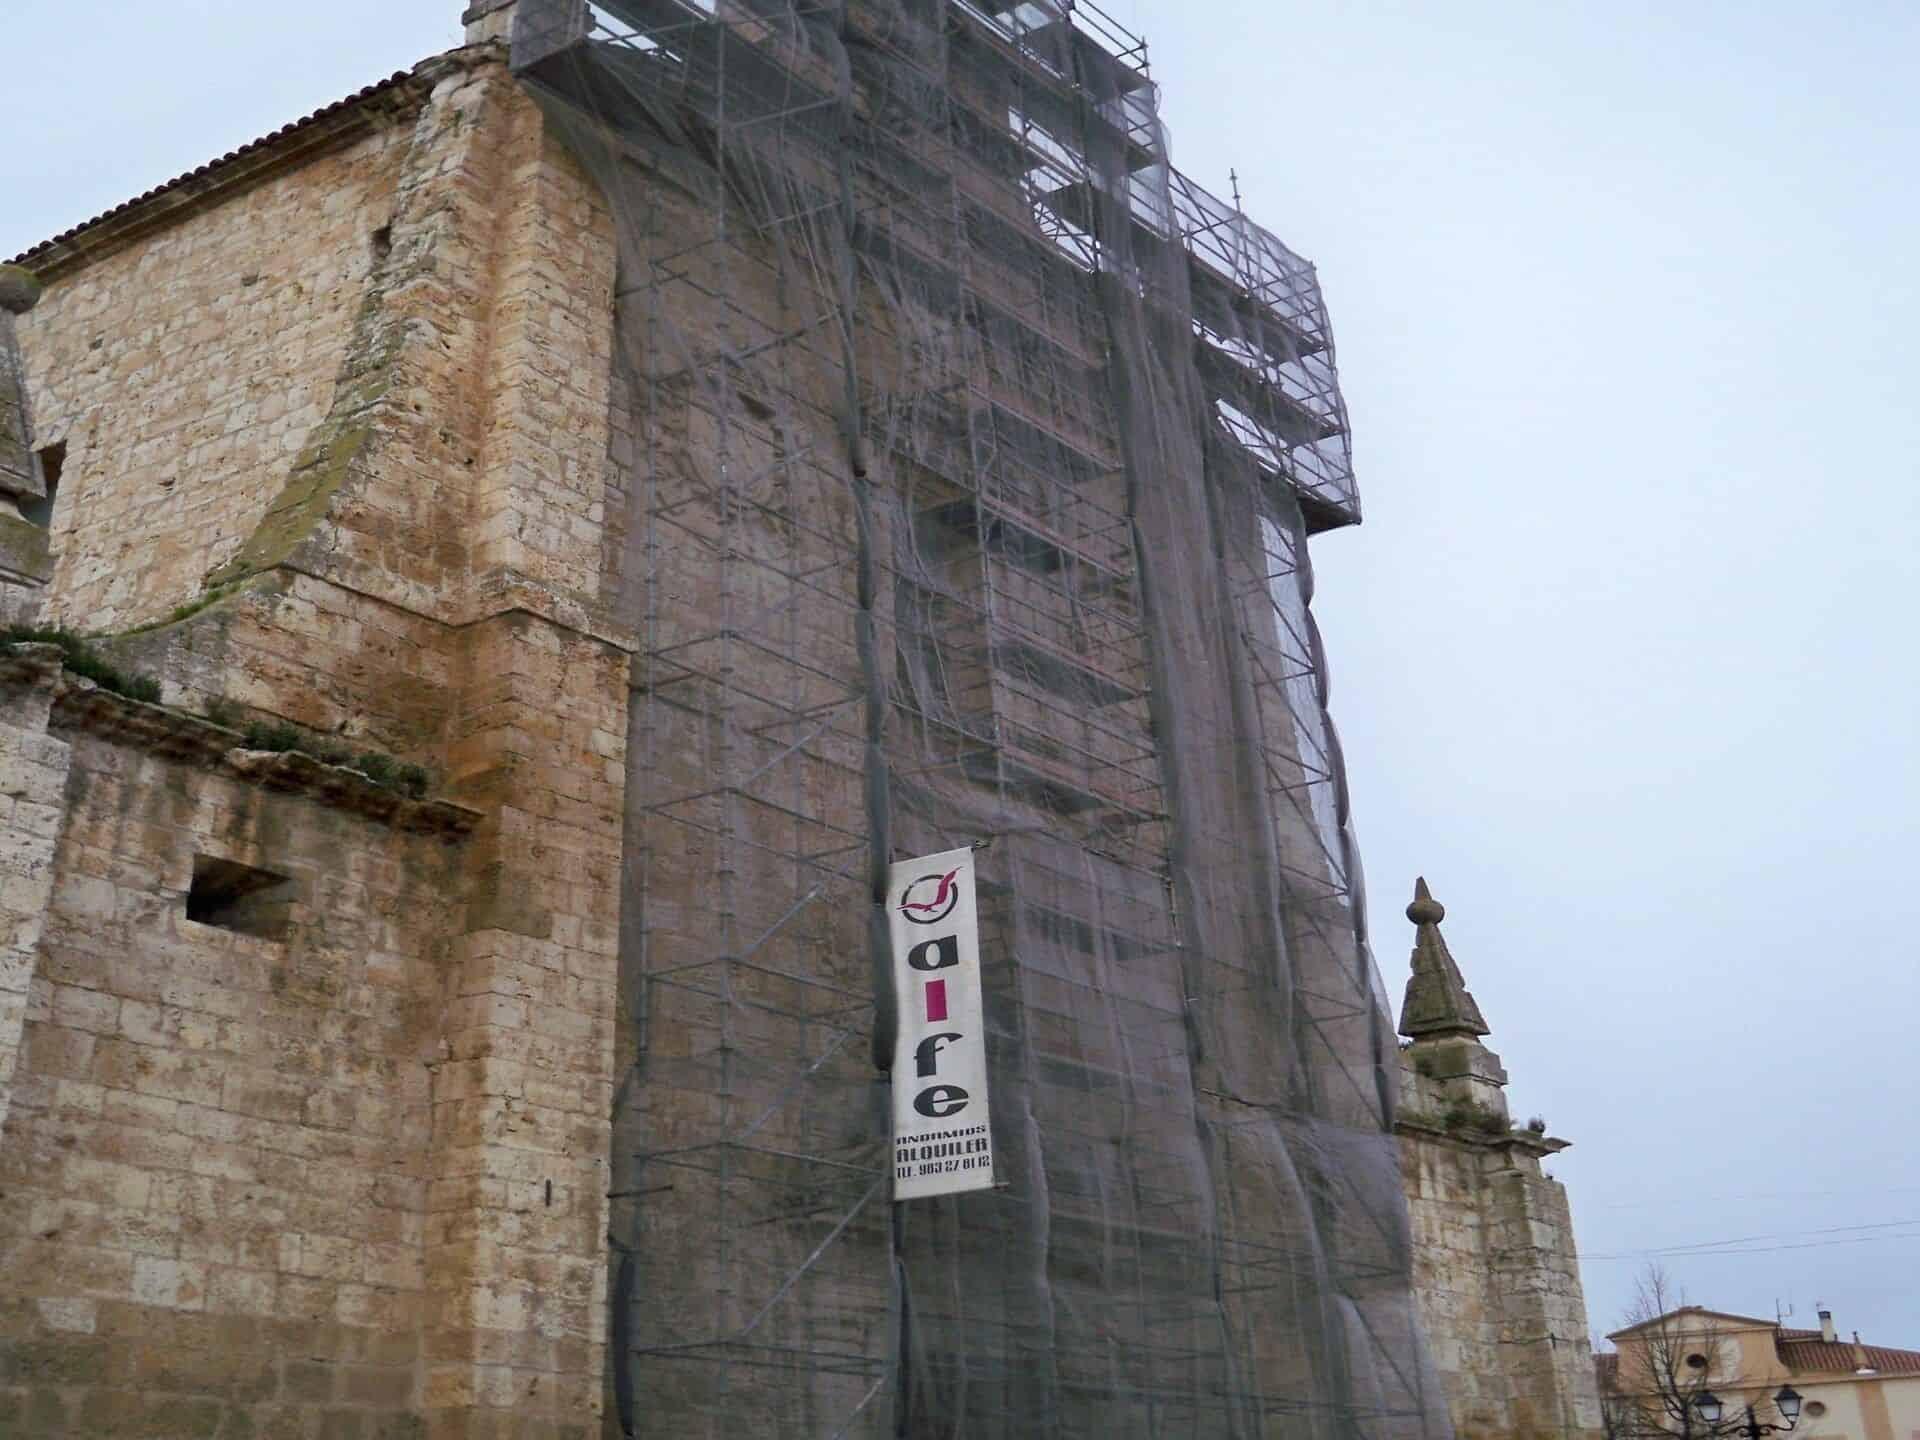 andamio-rehabilitacion-iglesia-san-agustin (1)_s